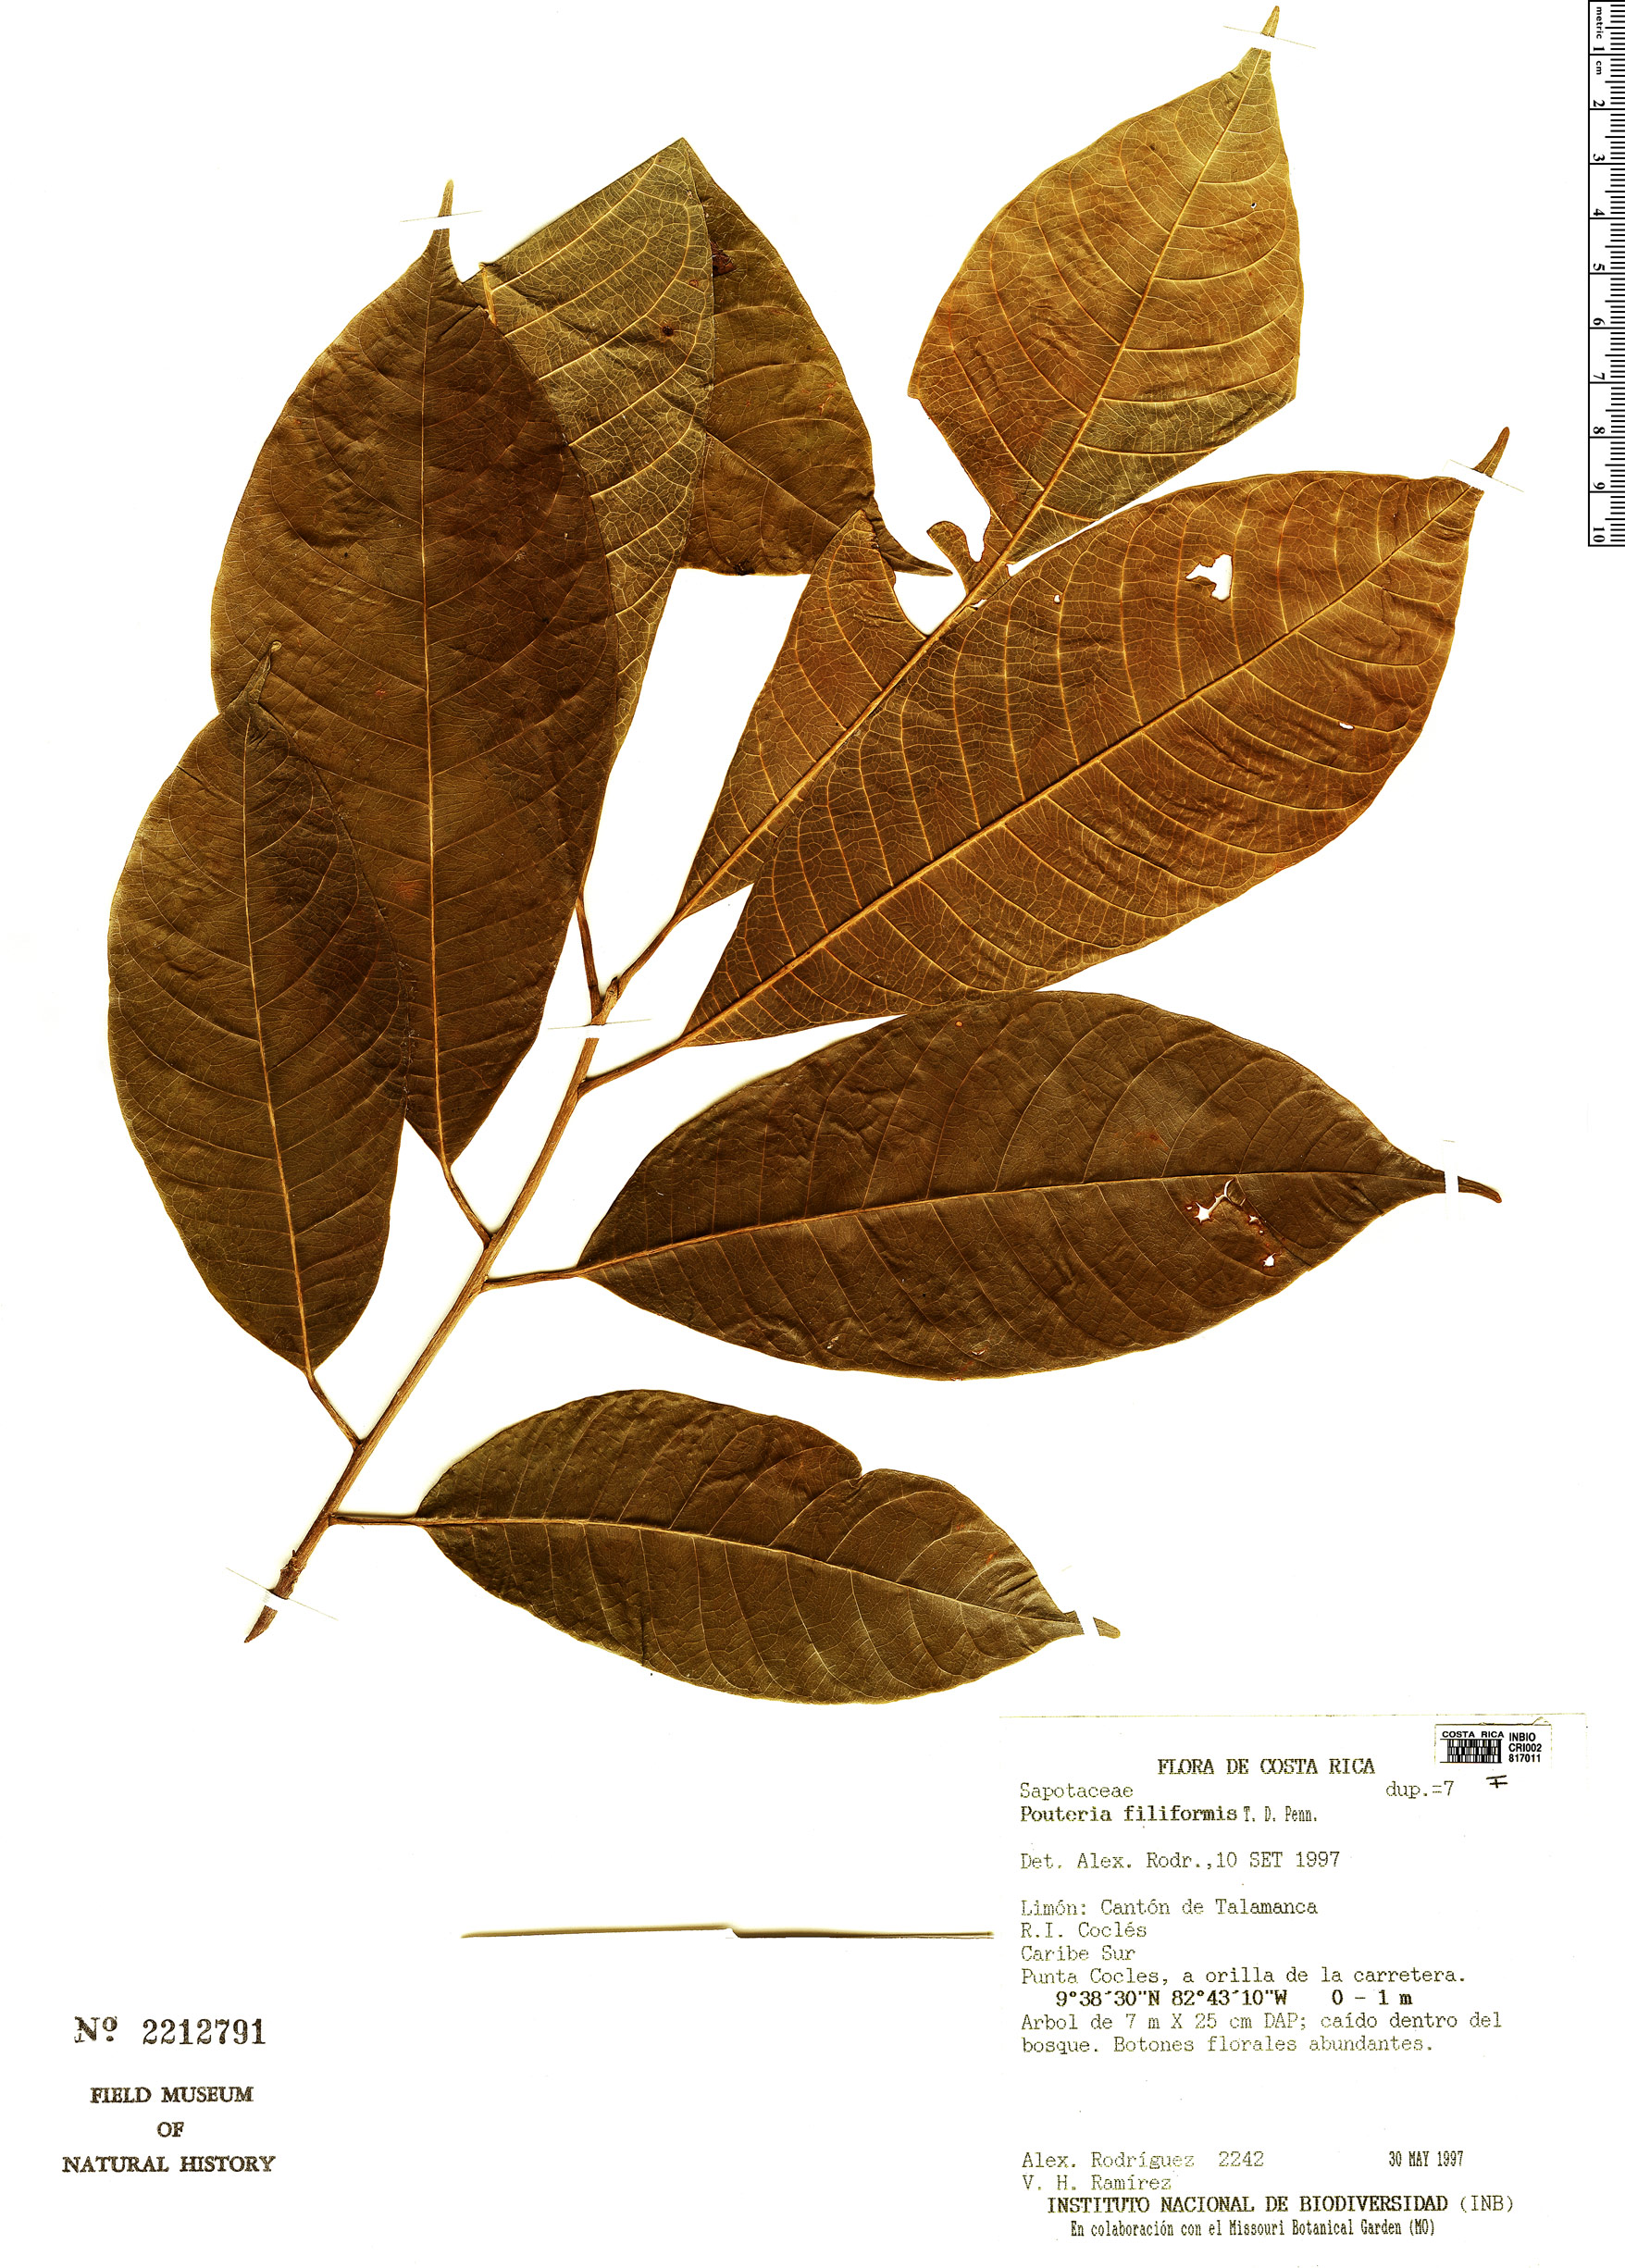 Specimen: Pouteria filiformis